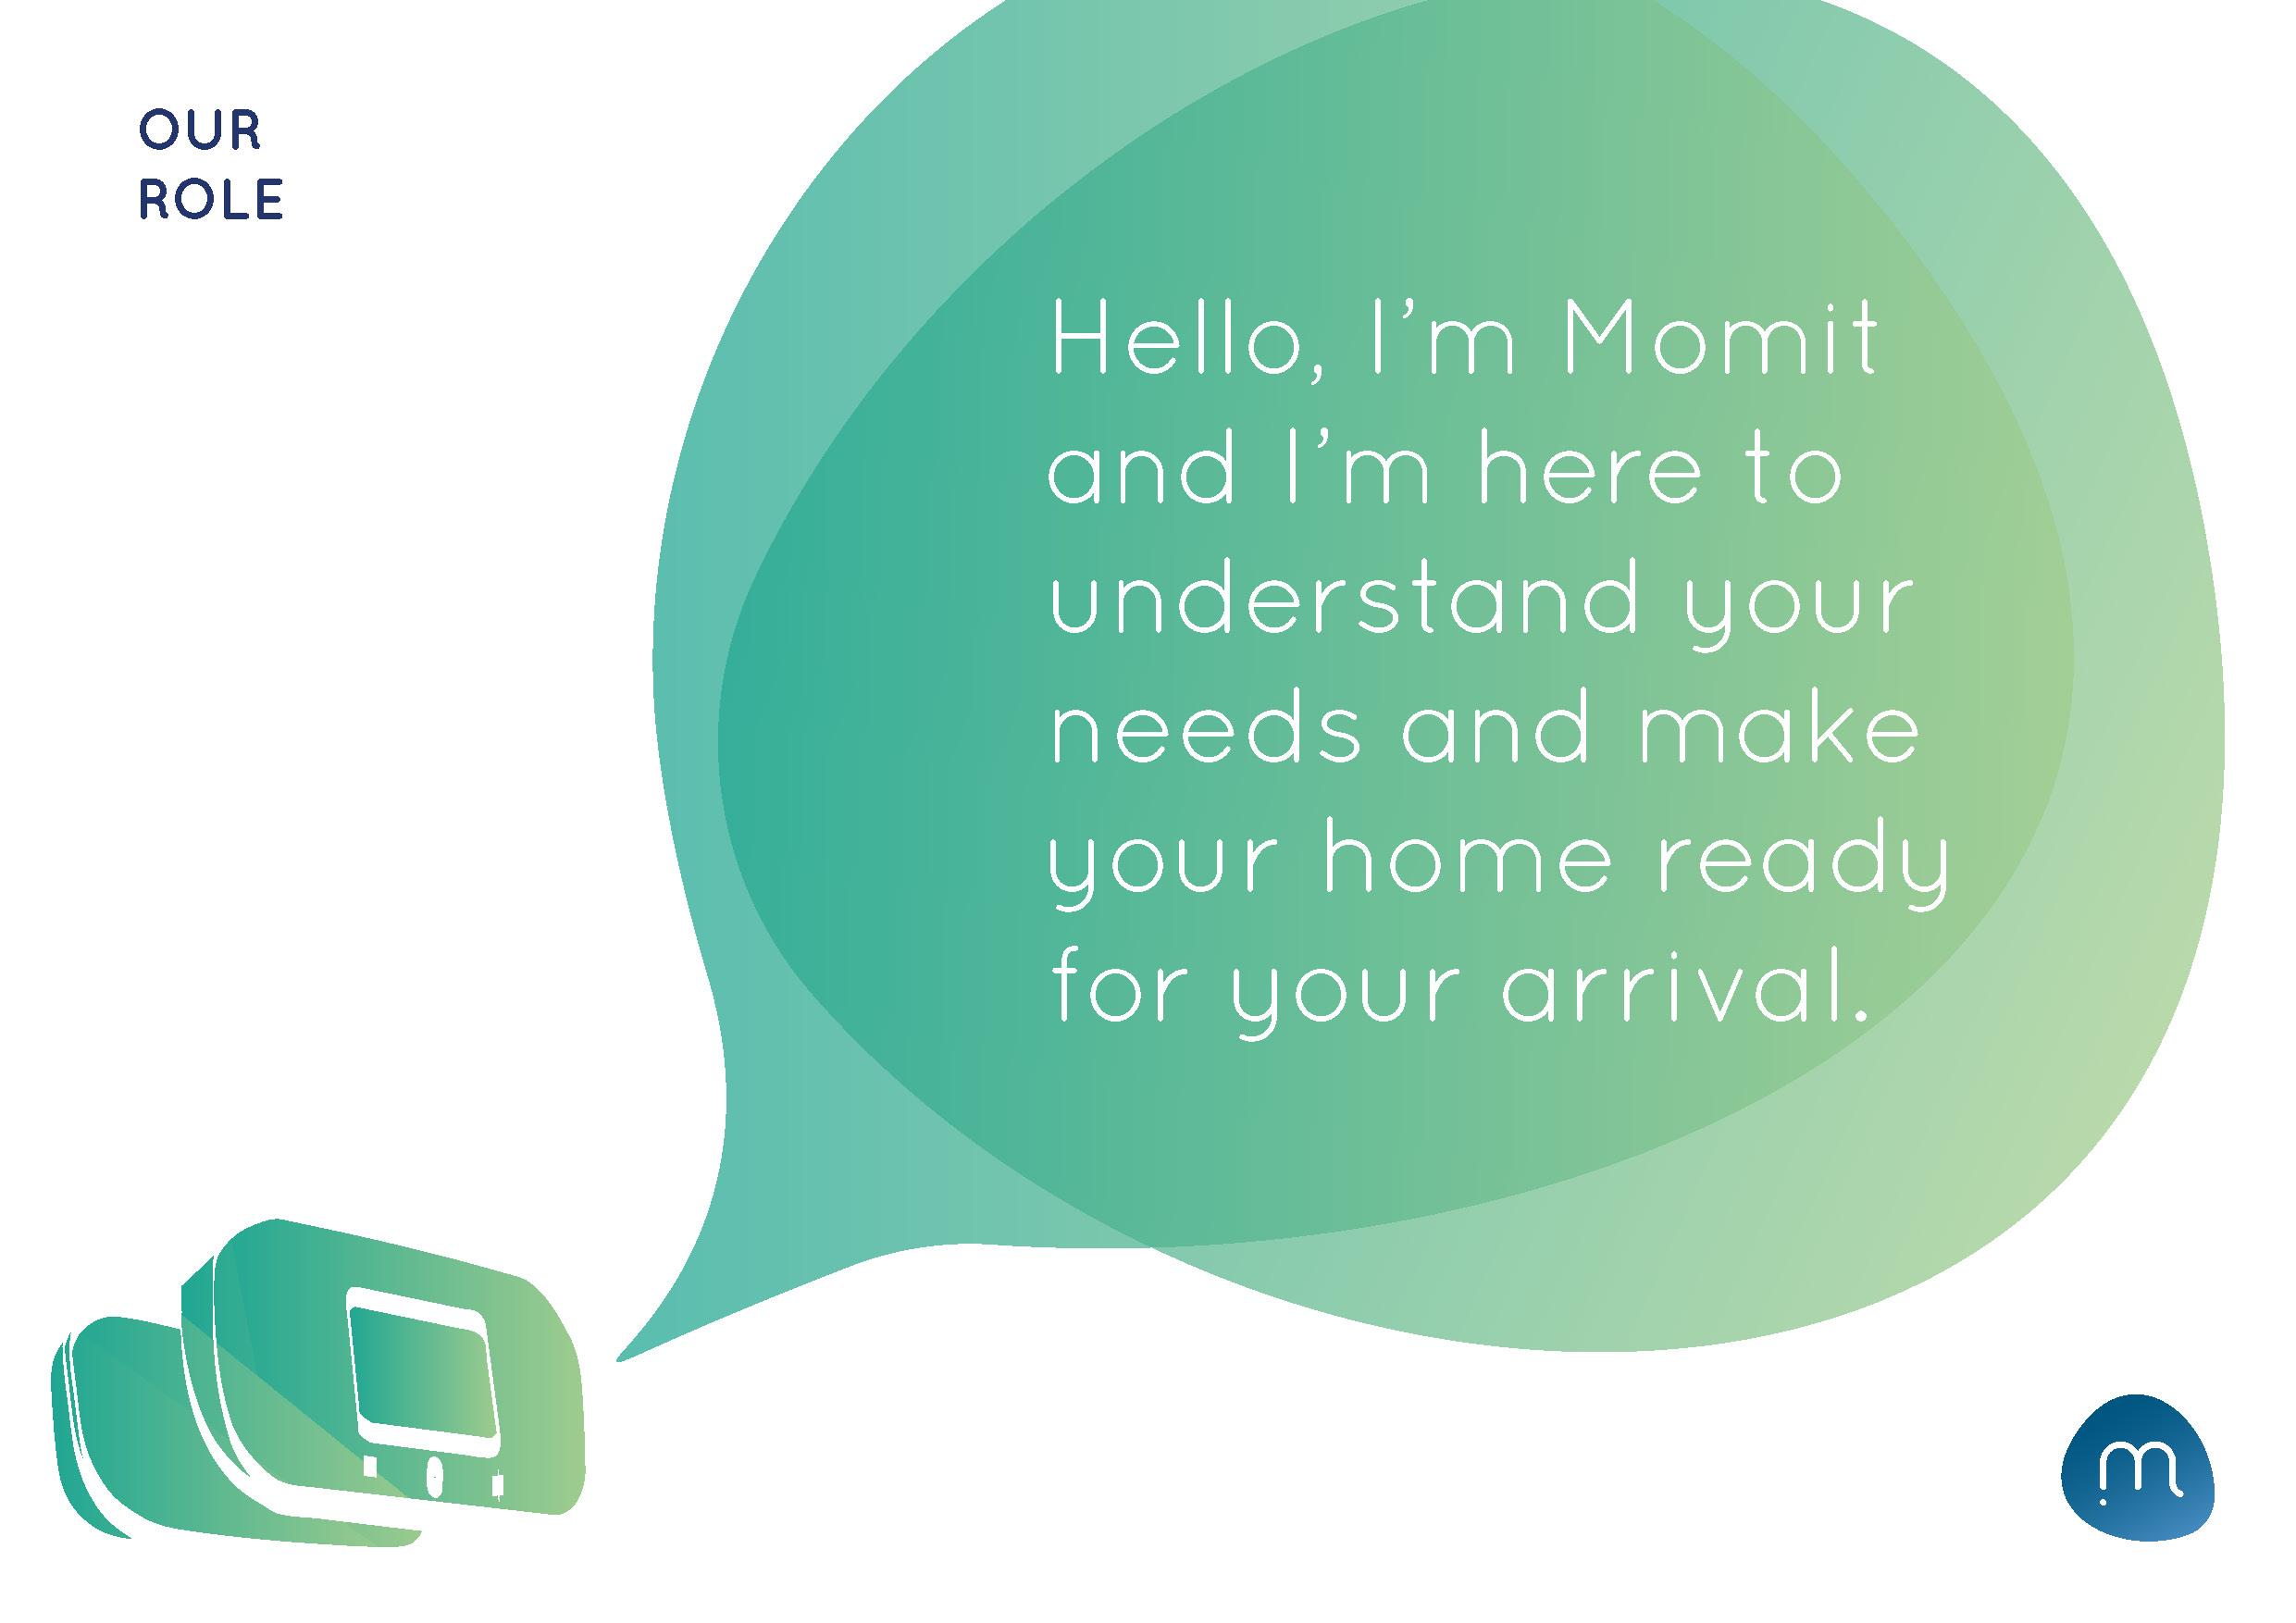 MOMIT FINAL PRESENTATION_Page_13.jpg